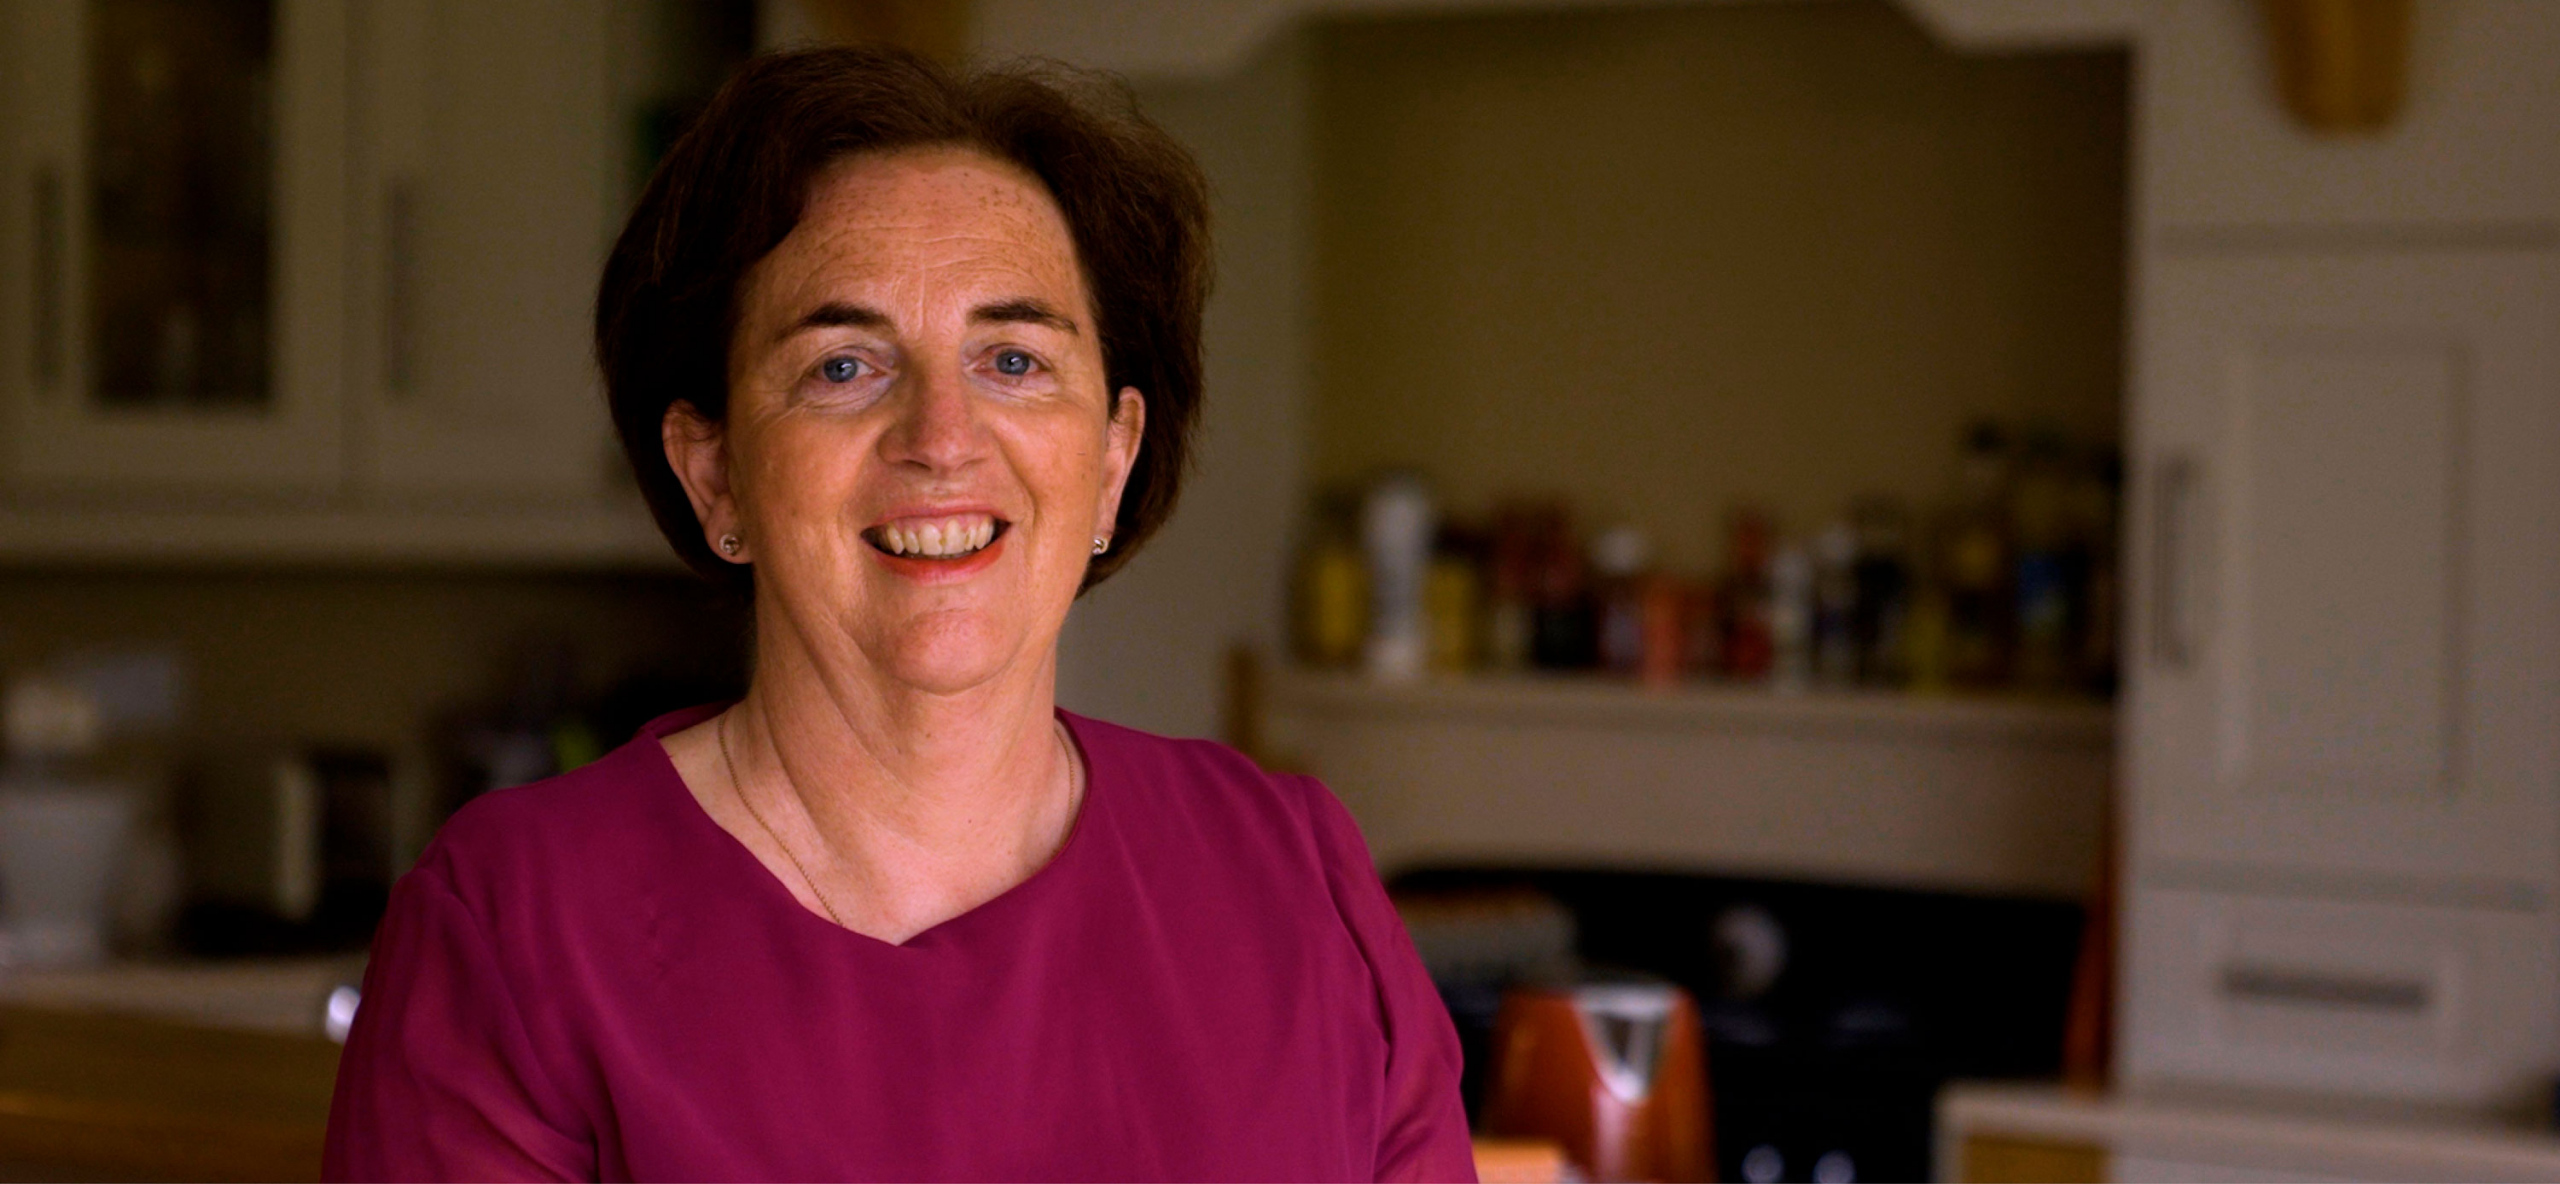 Irish Cancer Society Video & Photography and Radio Production